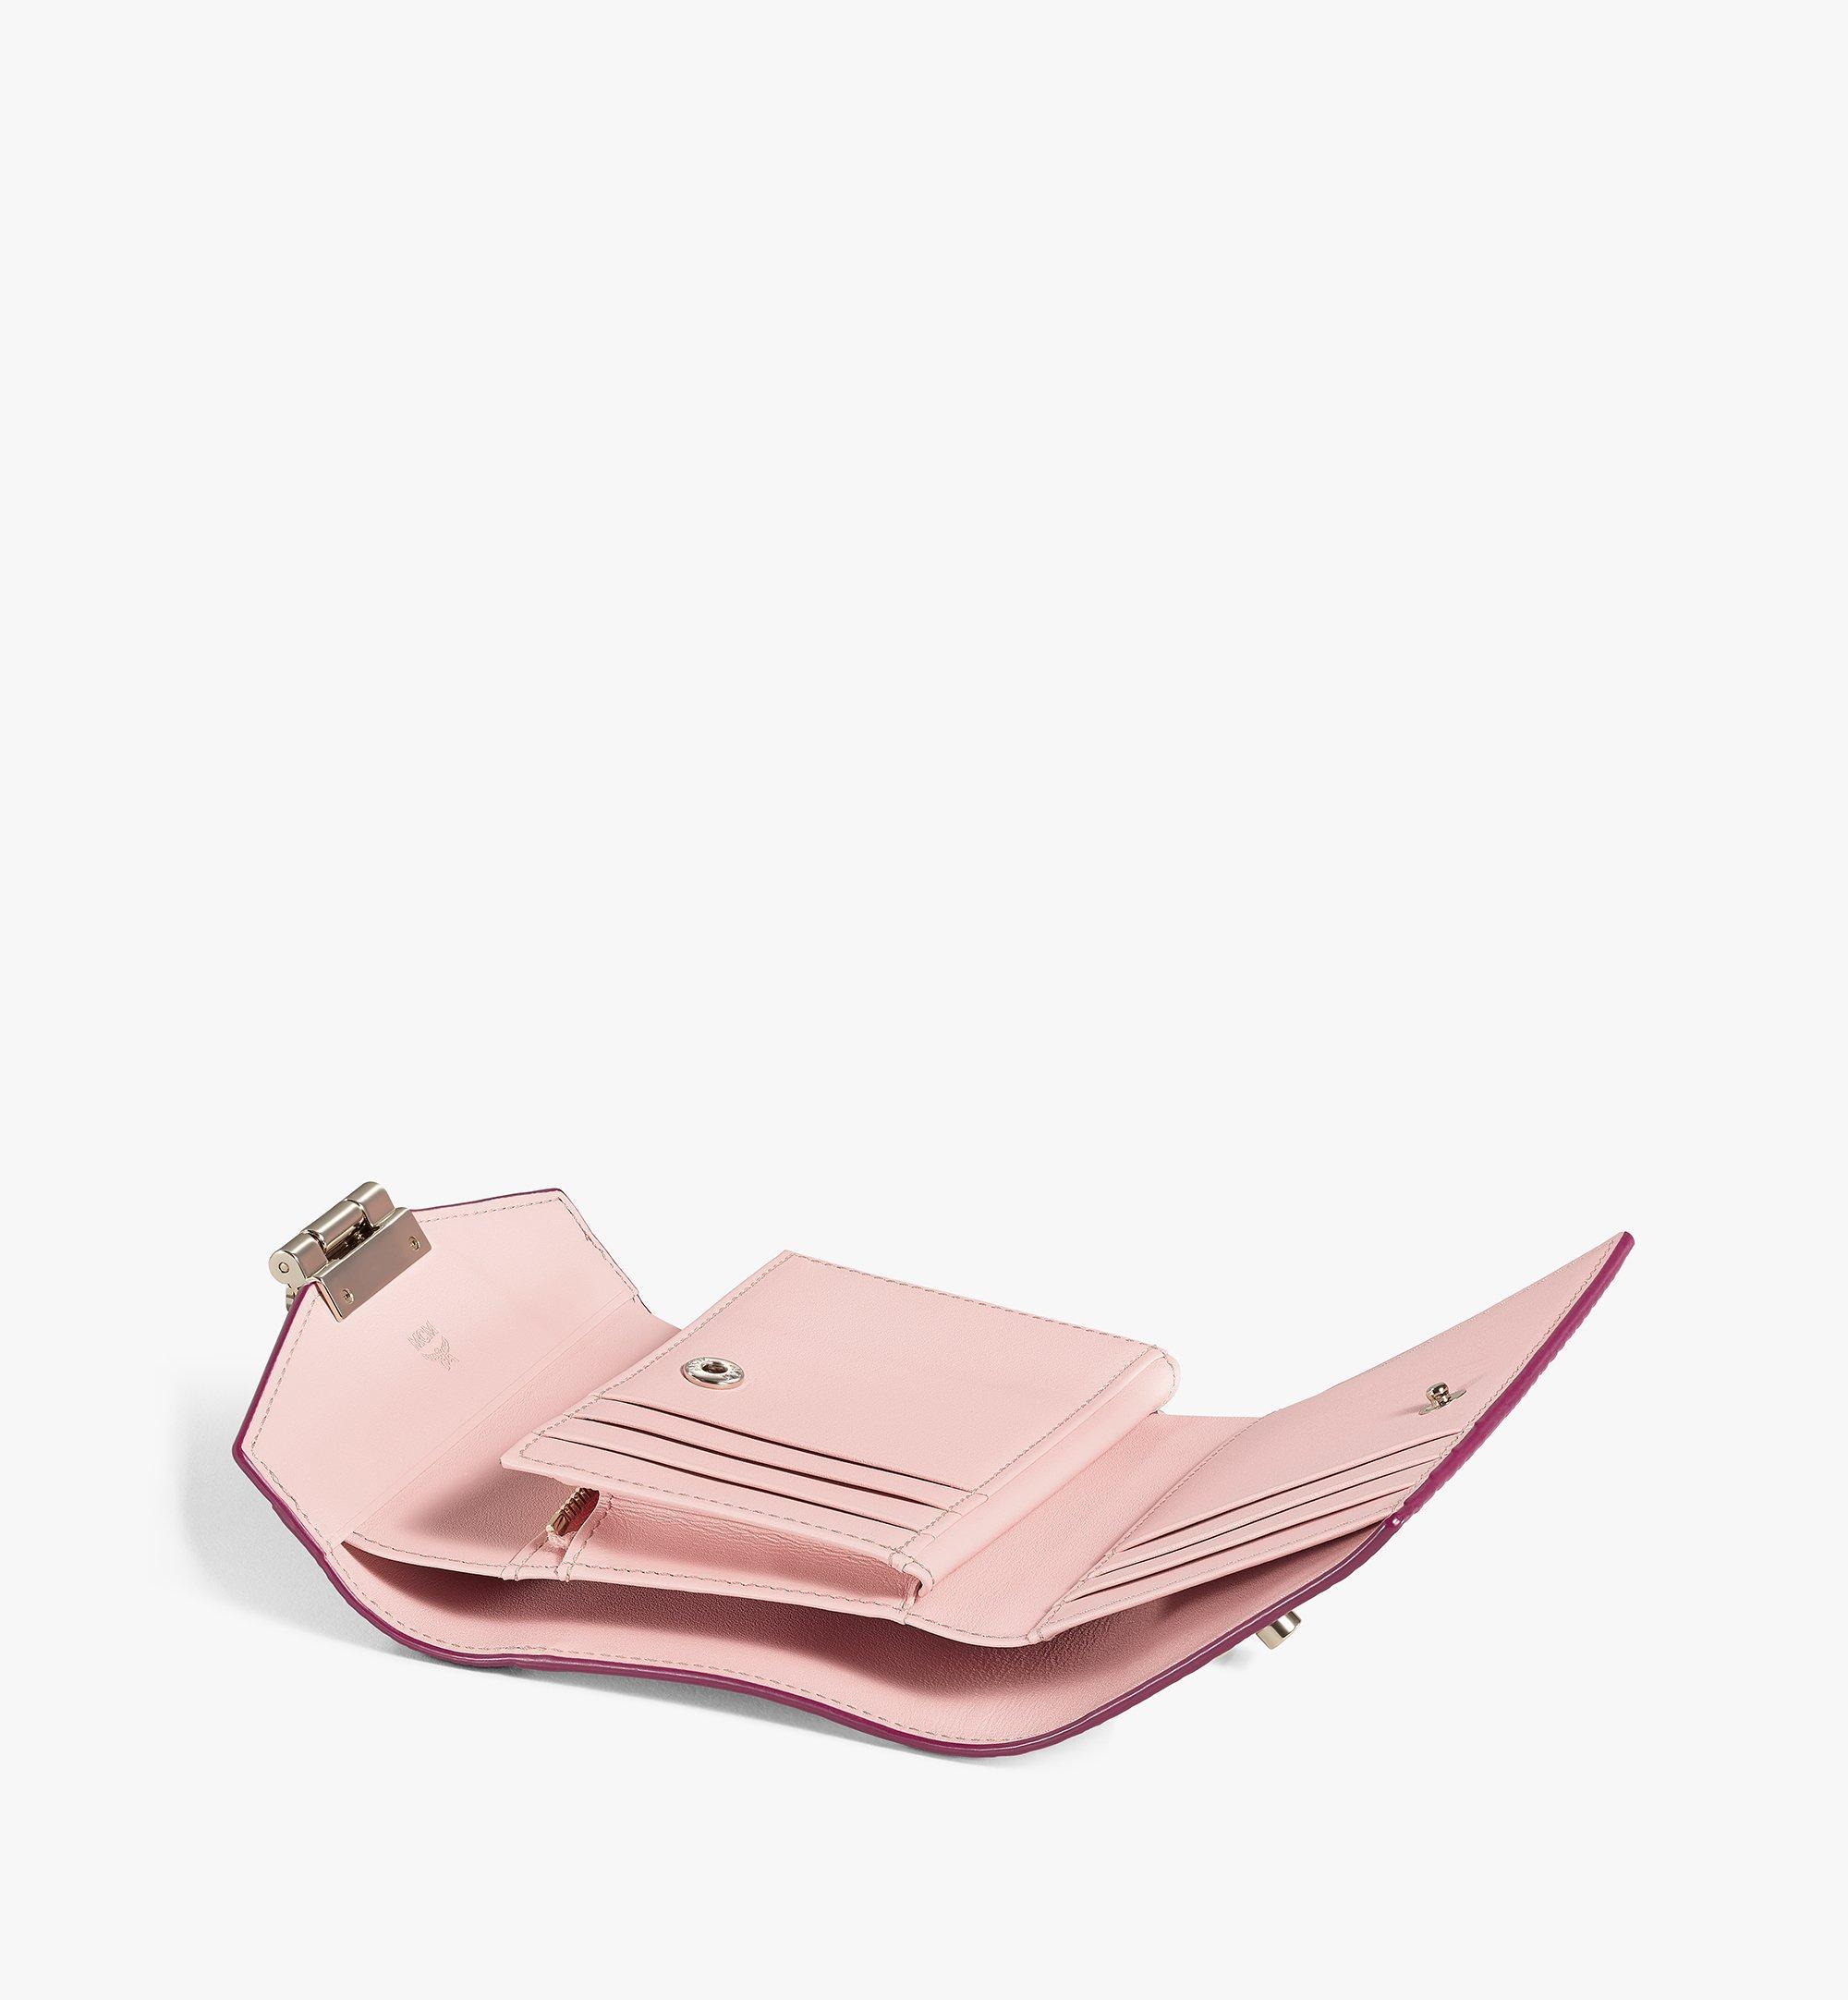 MCM Patricia Trifold Wallet in Color Block Visetos Pink MYSAAPA04QJ001 Alternate View 3